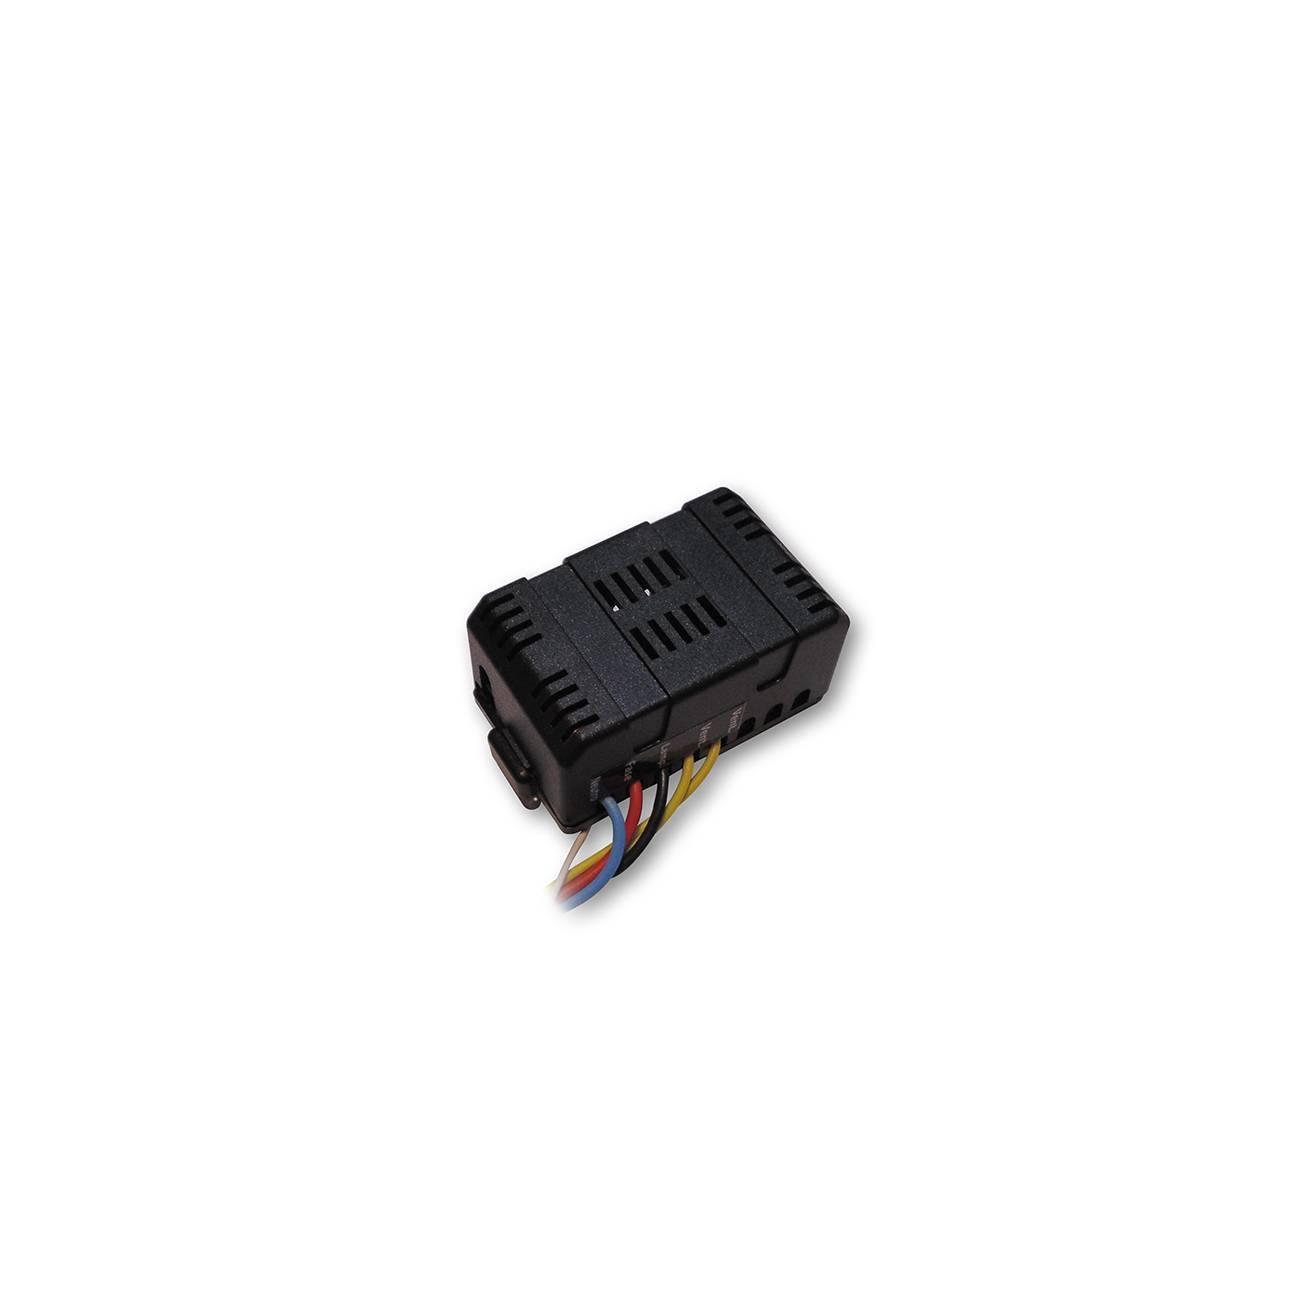 Controle Remoto Para Ventilador De Parede Wireless Lcg Eletr - LCGELETRO